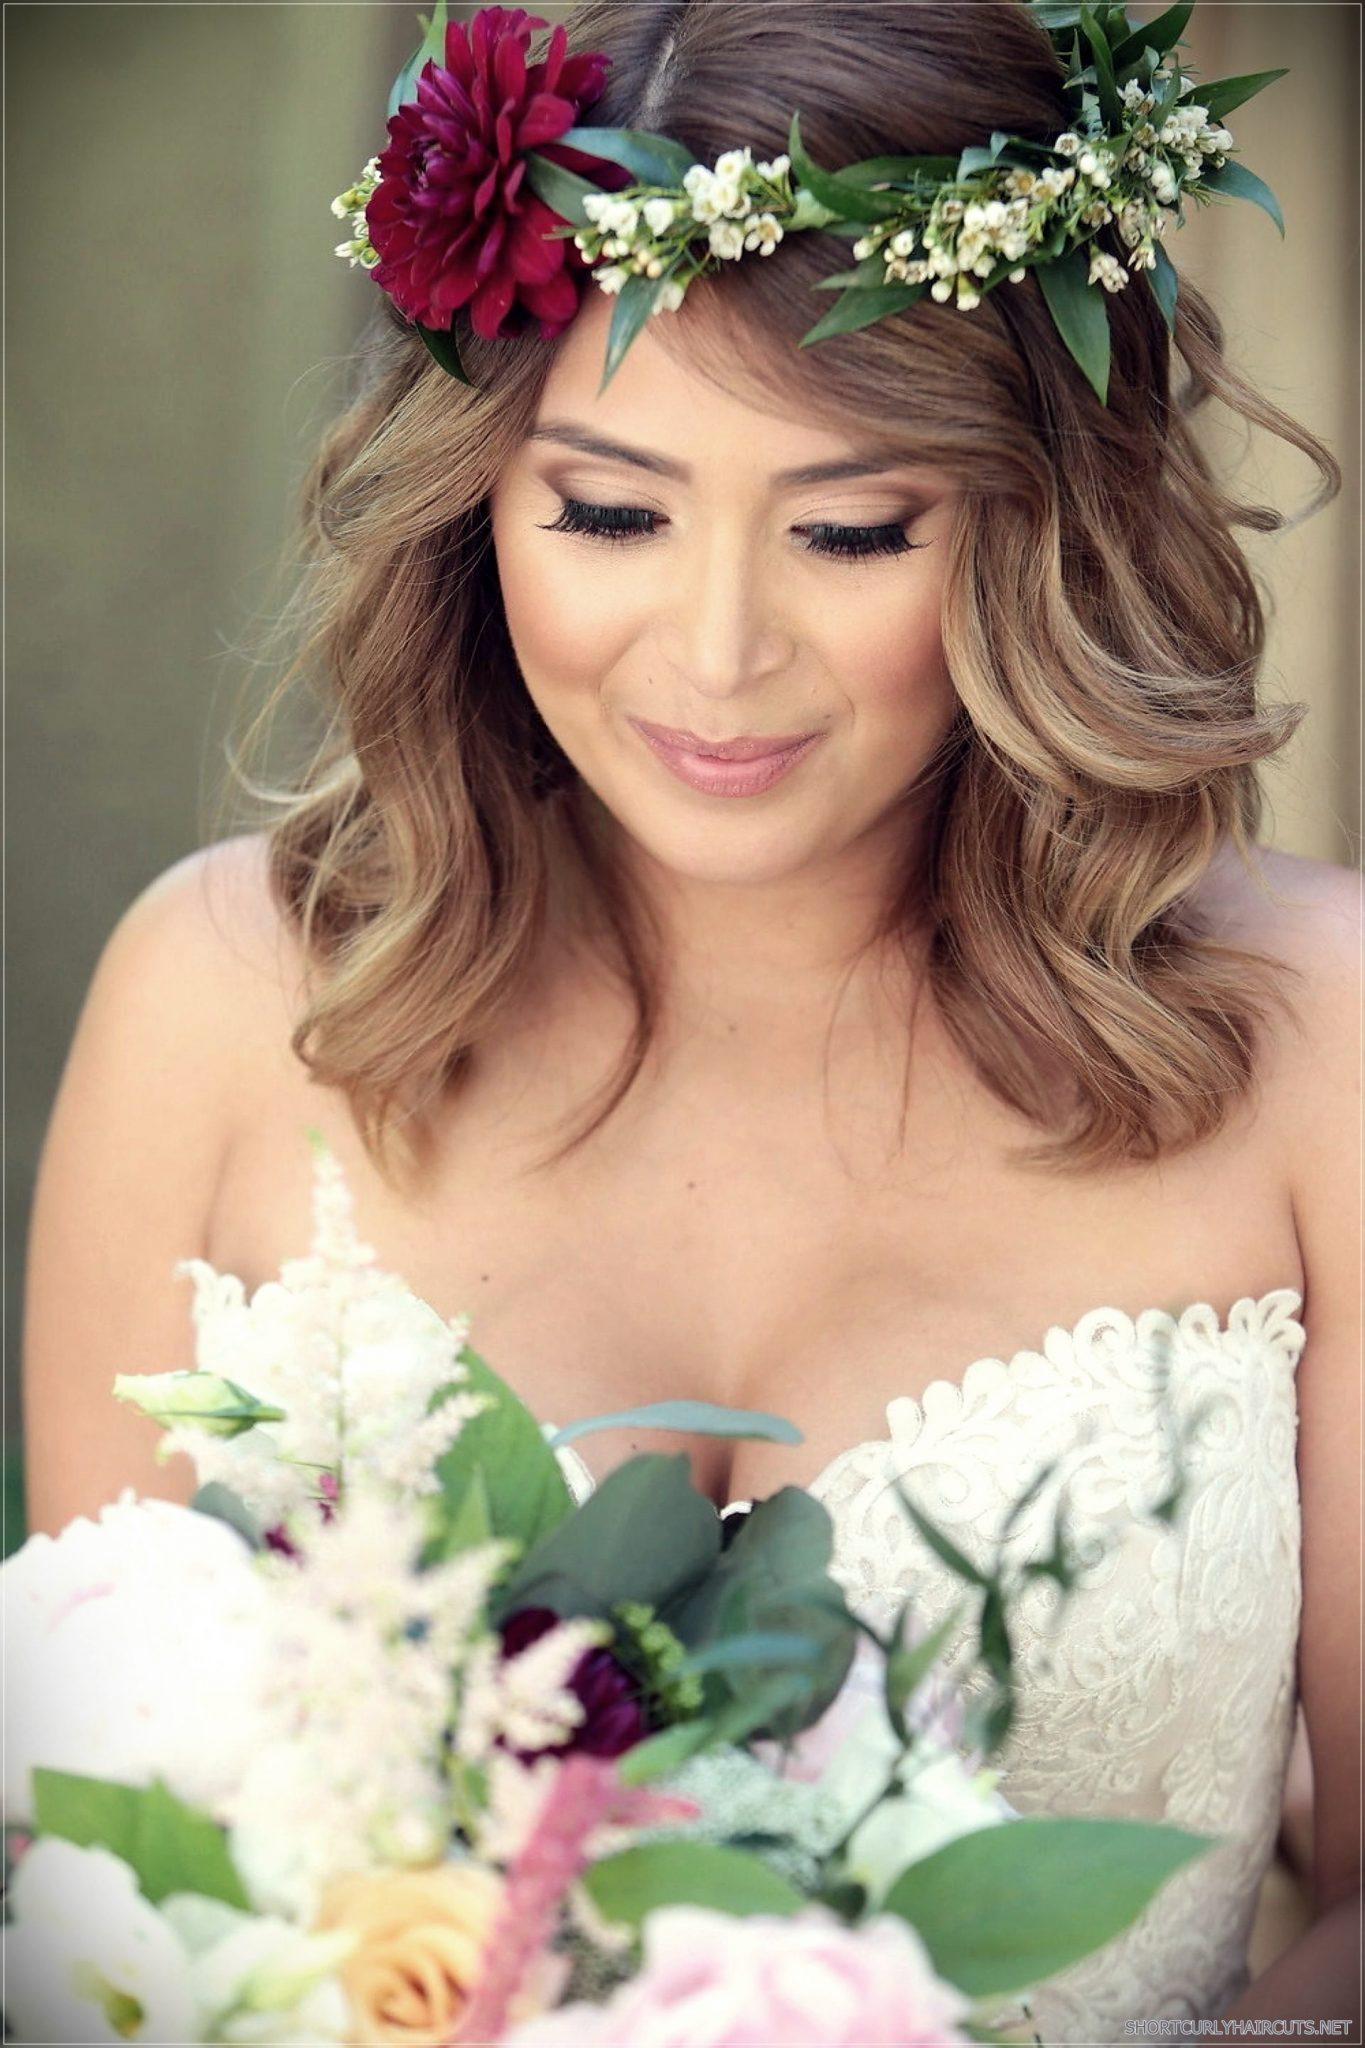 12 stunning short hairstyles for weddings short and curly haircuts stunning short hairstyles for weddings 19 12 stunning short hairstyles for weddings izmirmasajfo